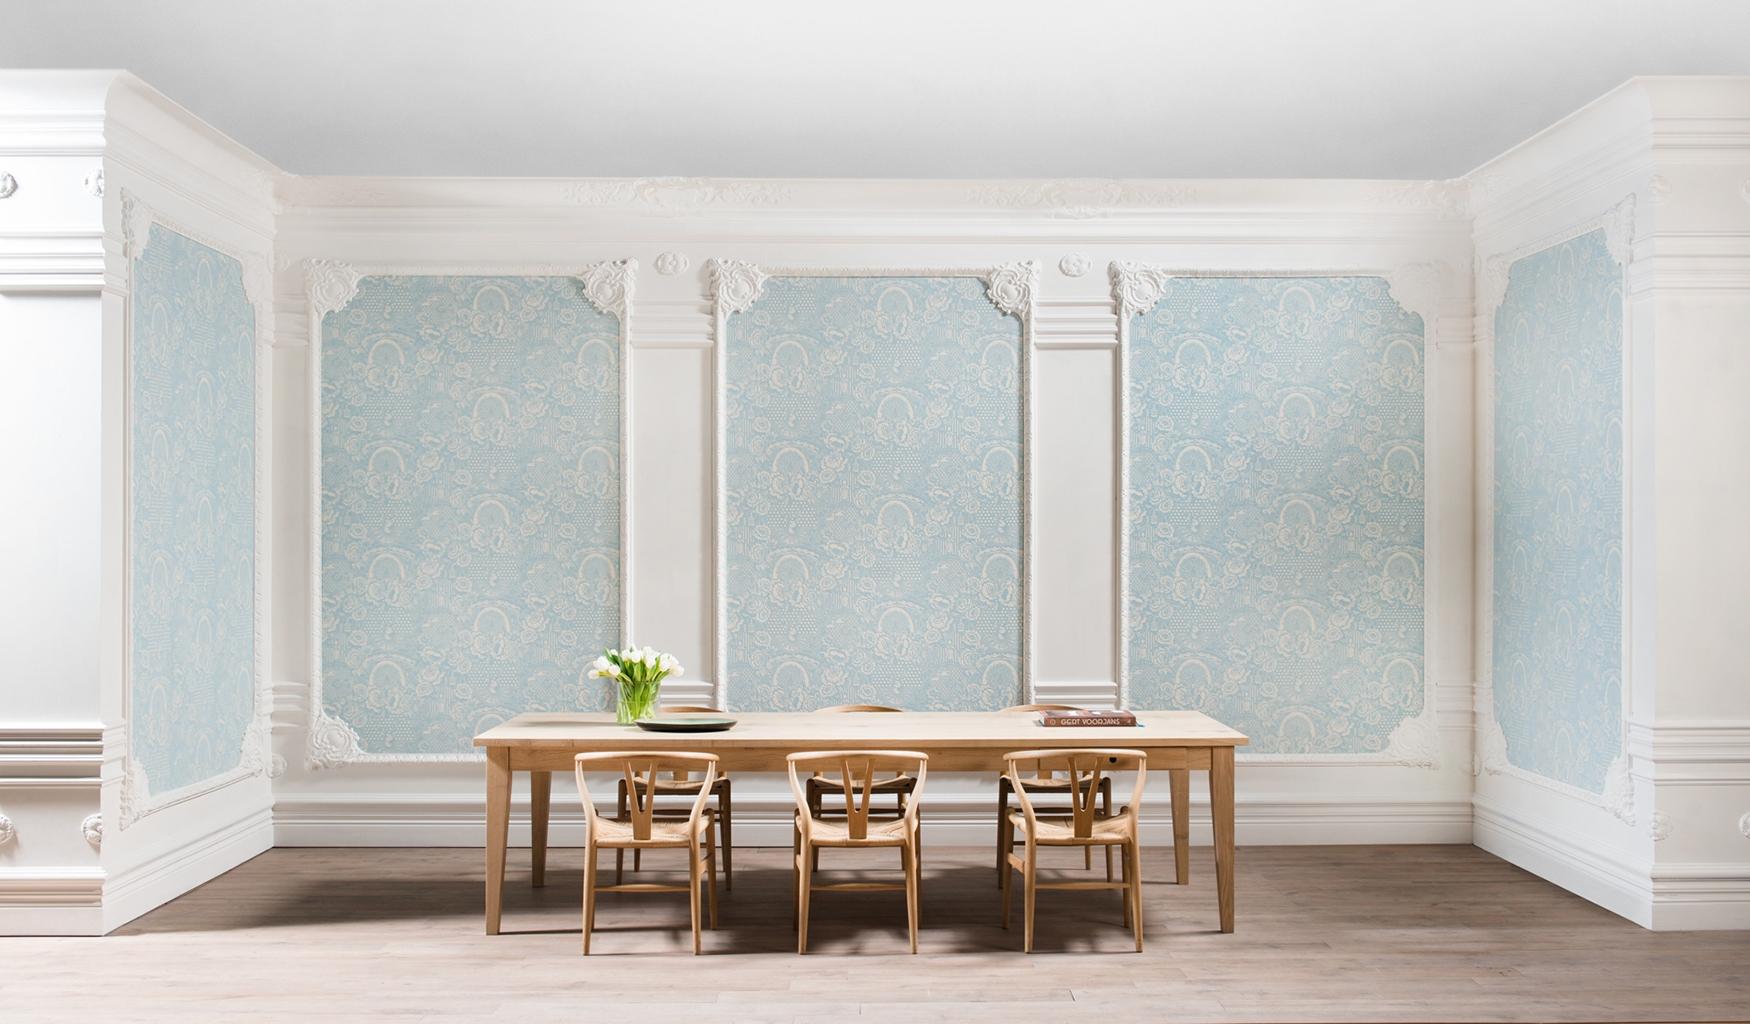 норникеле фото отделки декоративным плинтусом на стене модели